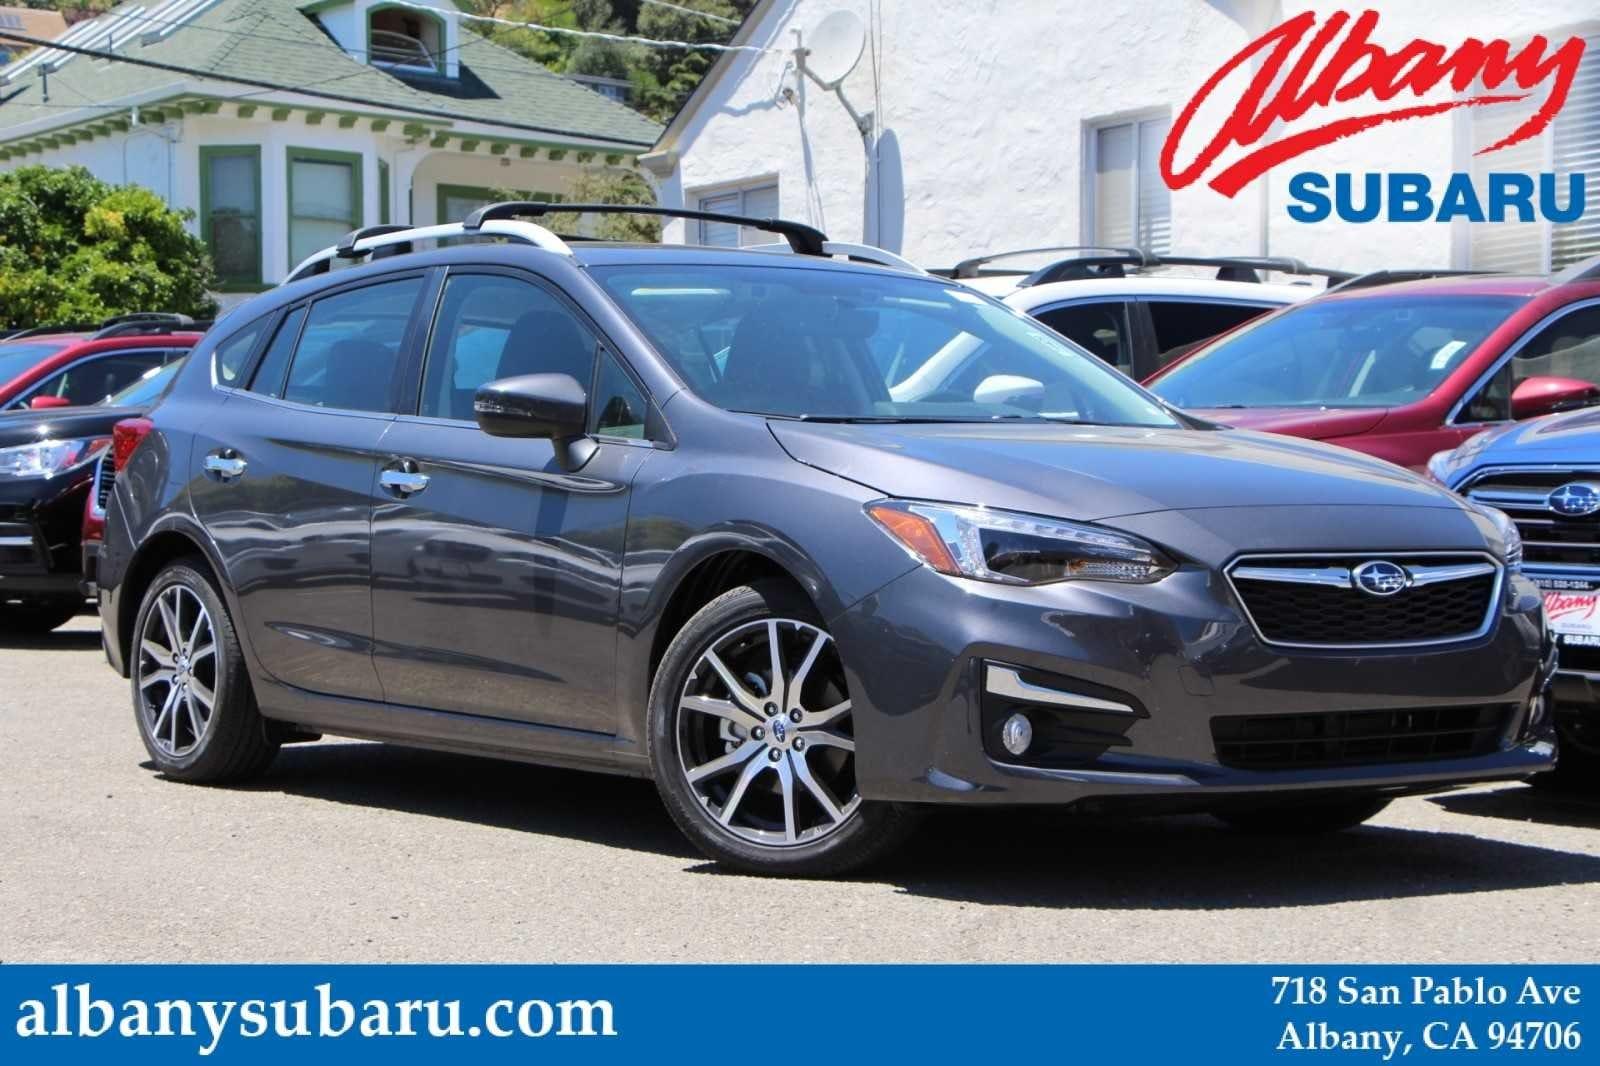 Subaru Impreza Hatchback For Sale >> New 2019 Subaru Impreza 2 0i Limited For Sale In Albany Ca San Francisco East Bay Area 74409